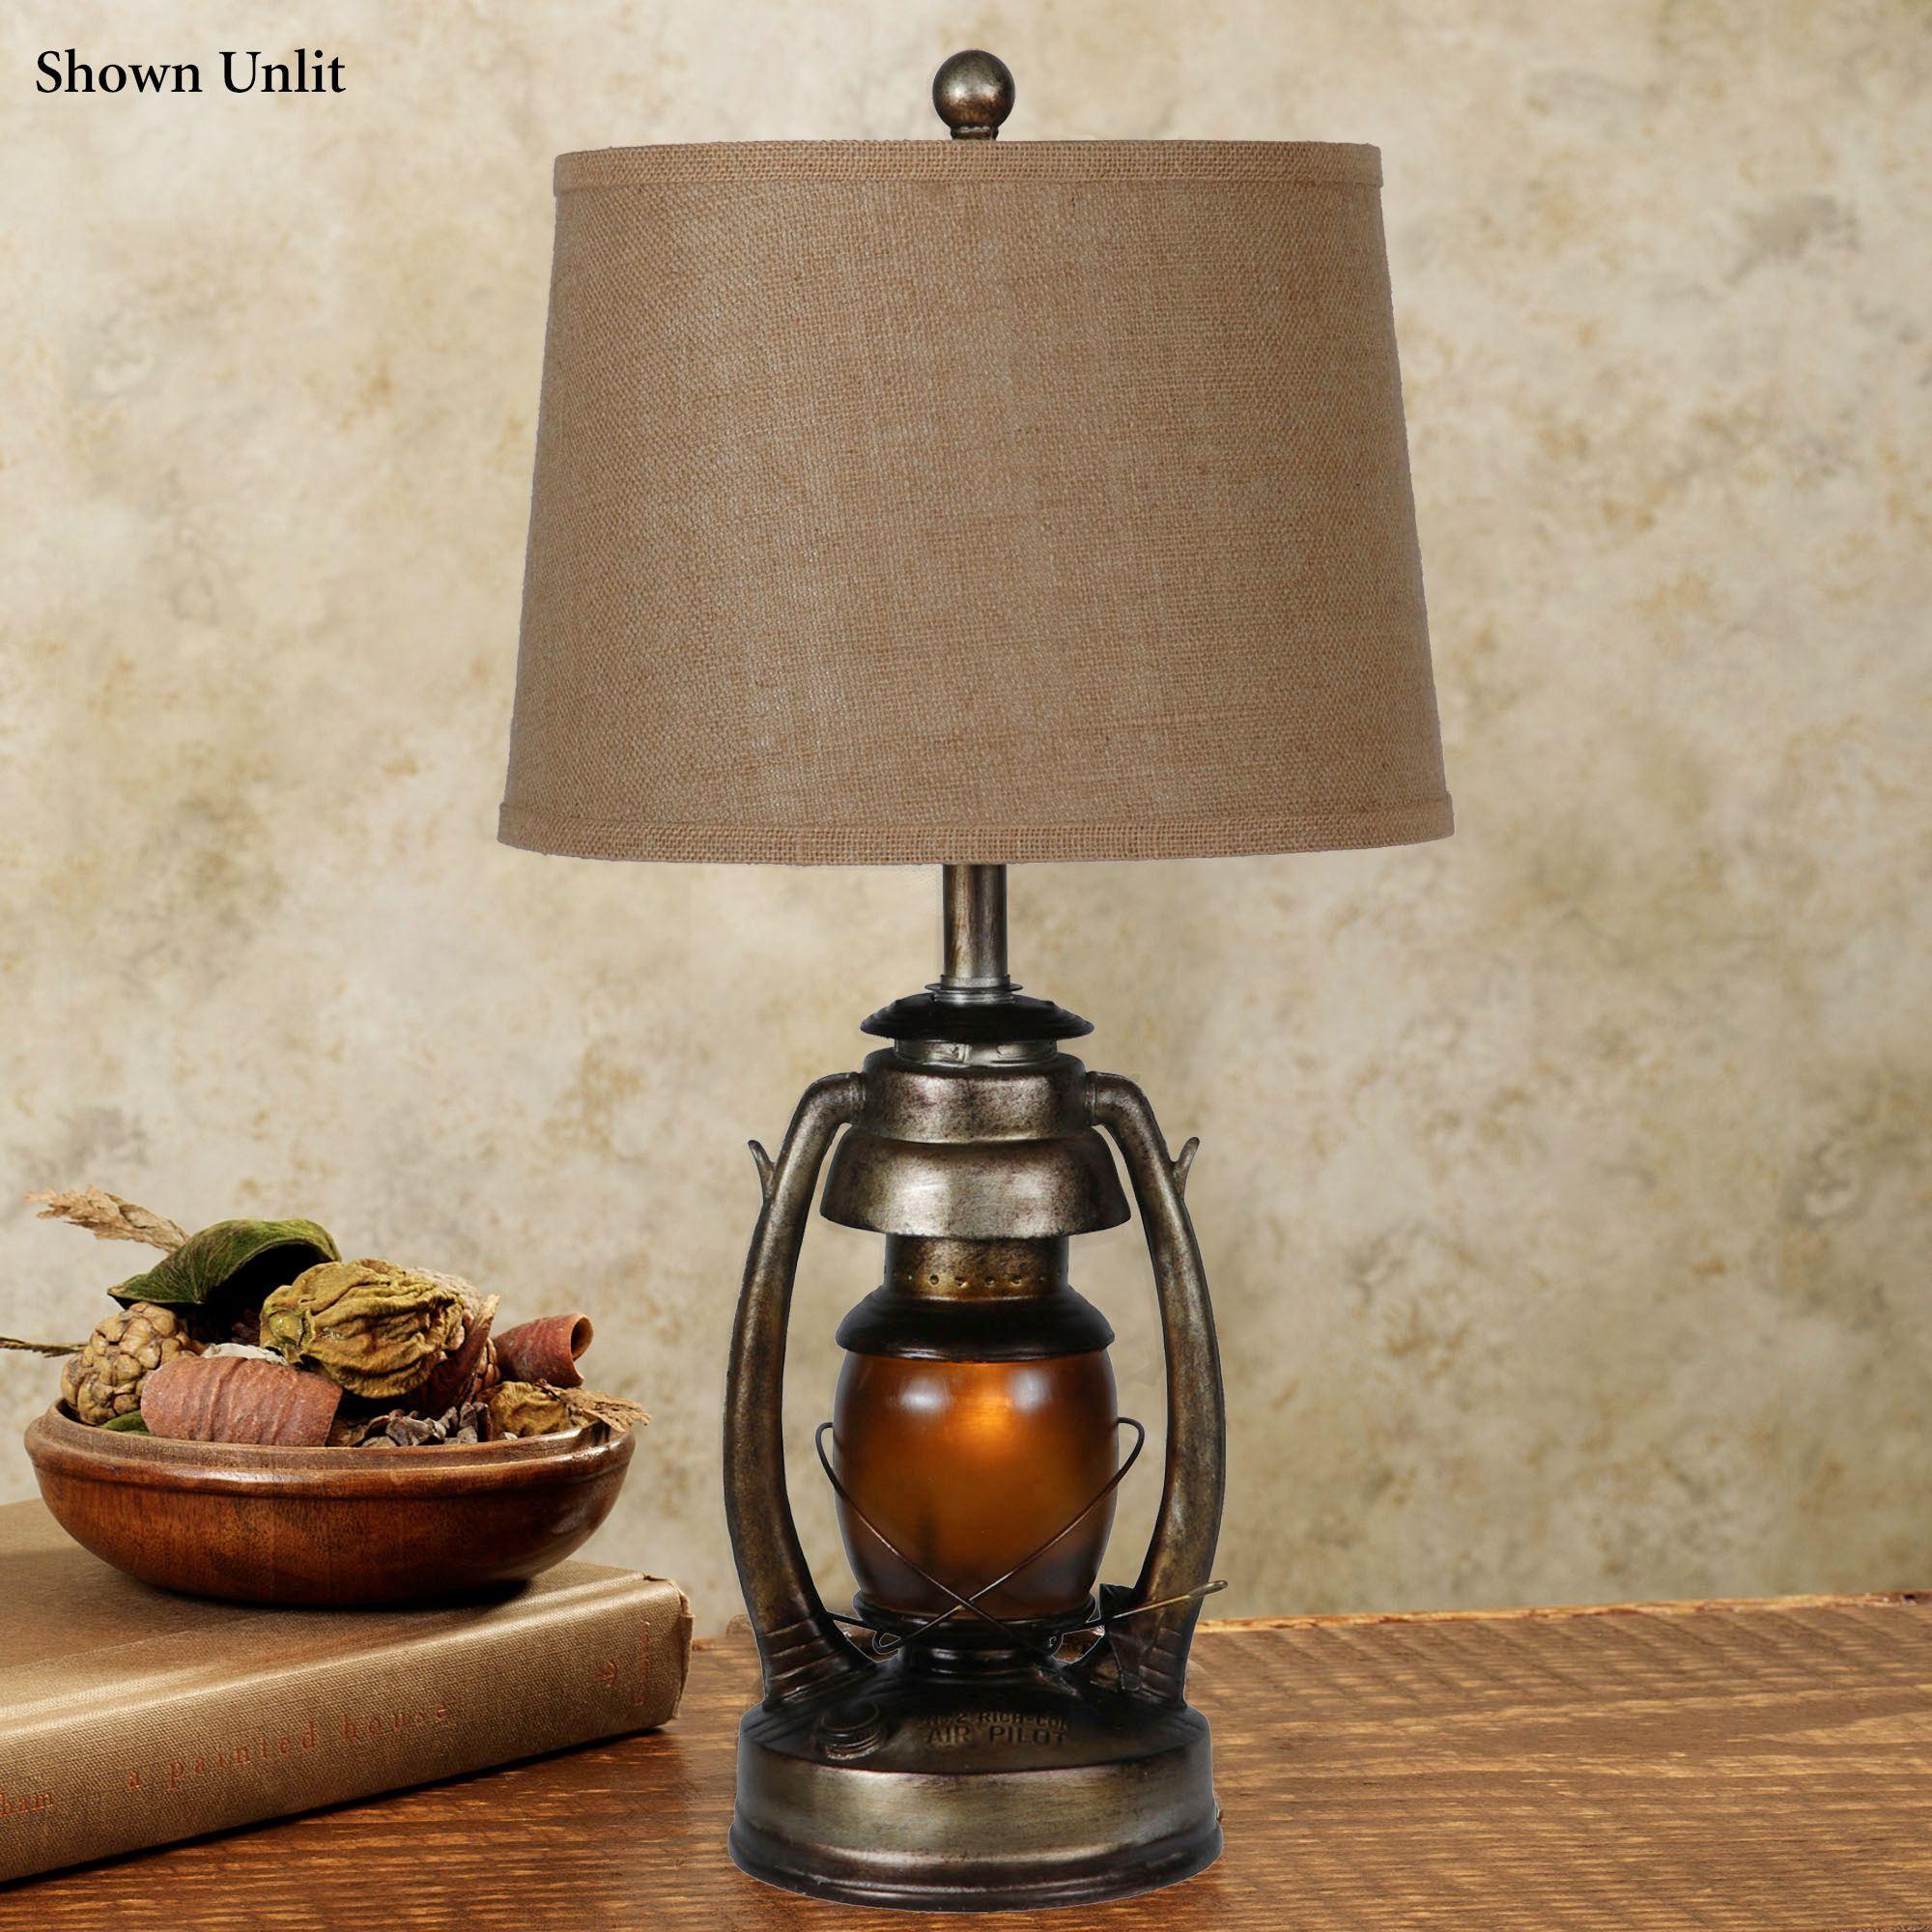 Sherlock Lantern Table Lamp with Nightlight Bulb